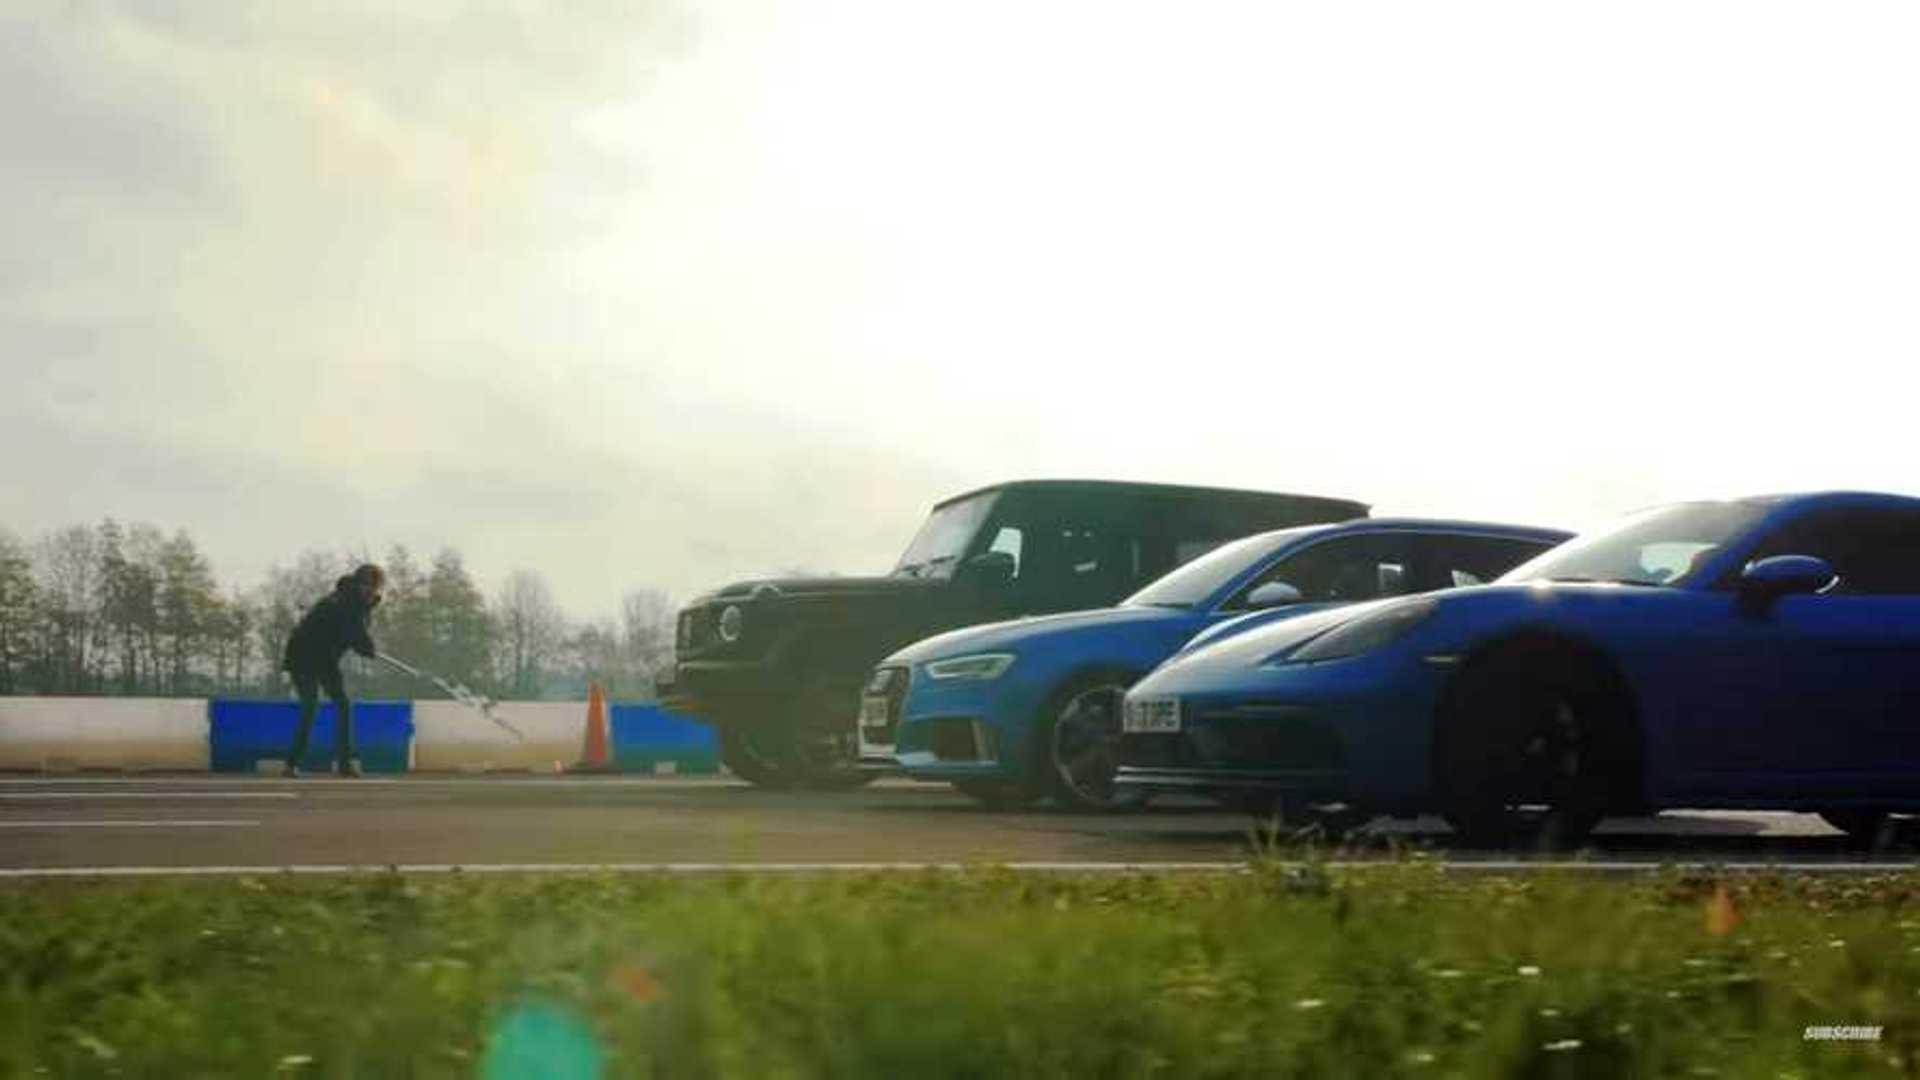 Watch Top Gear drag race AMG G63 vs Cayman GTS vs Audi RS3